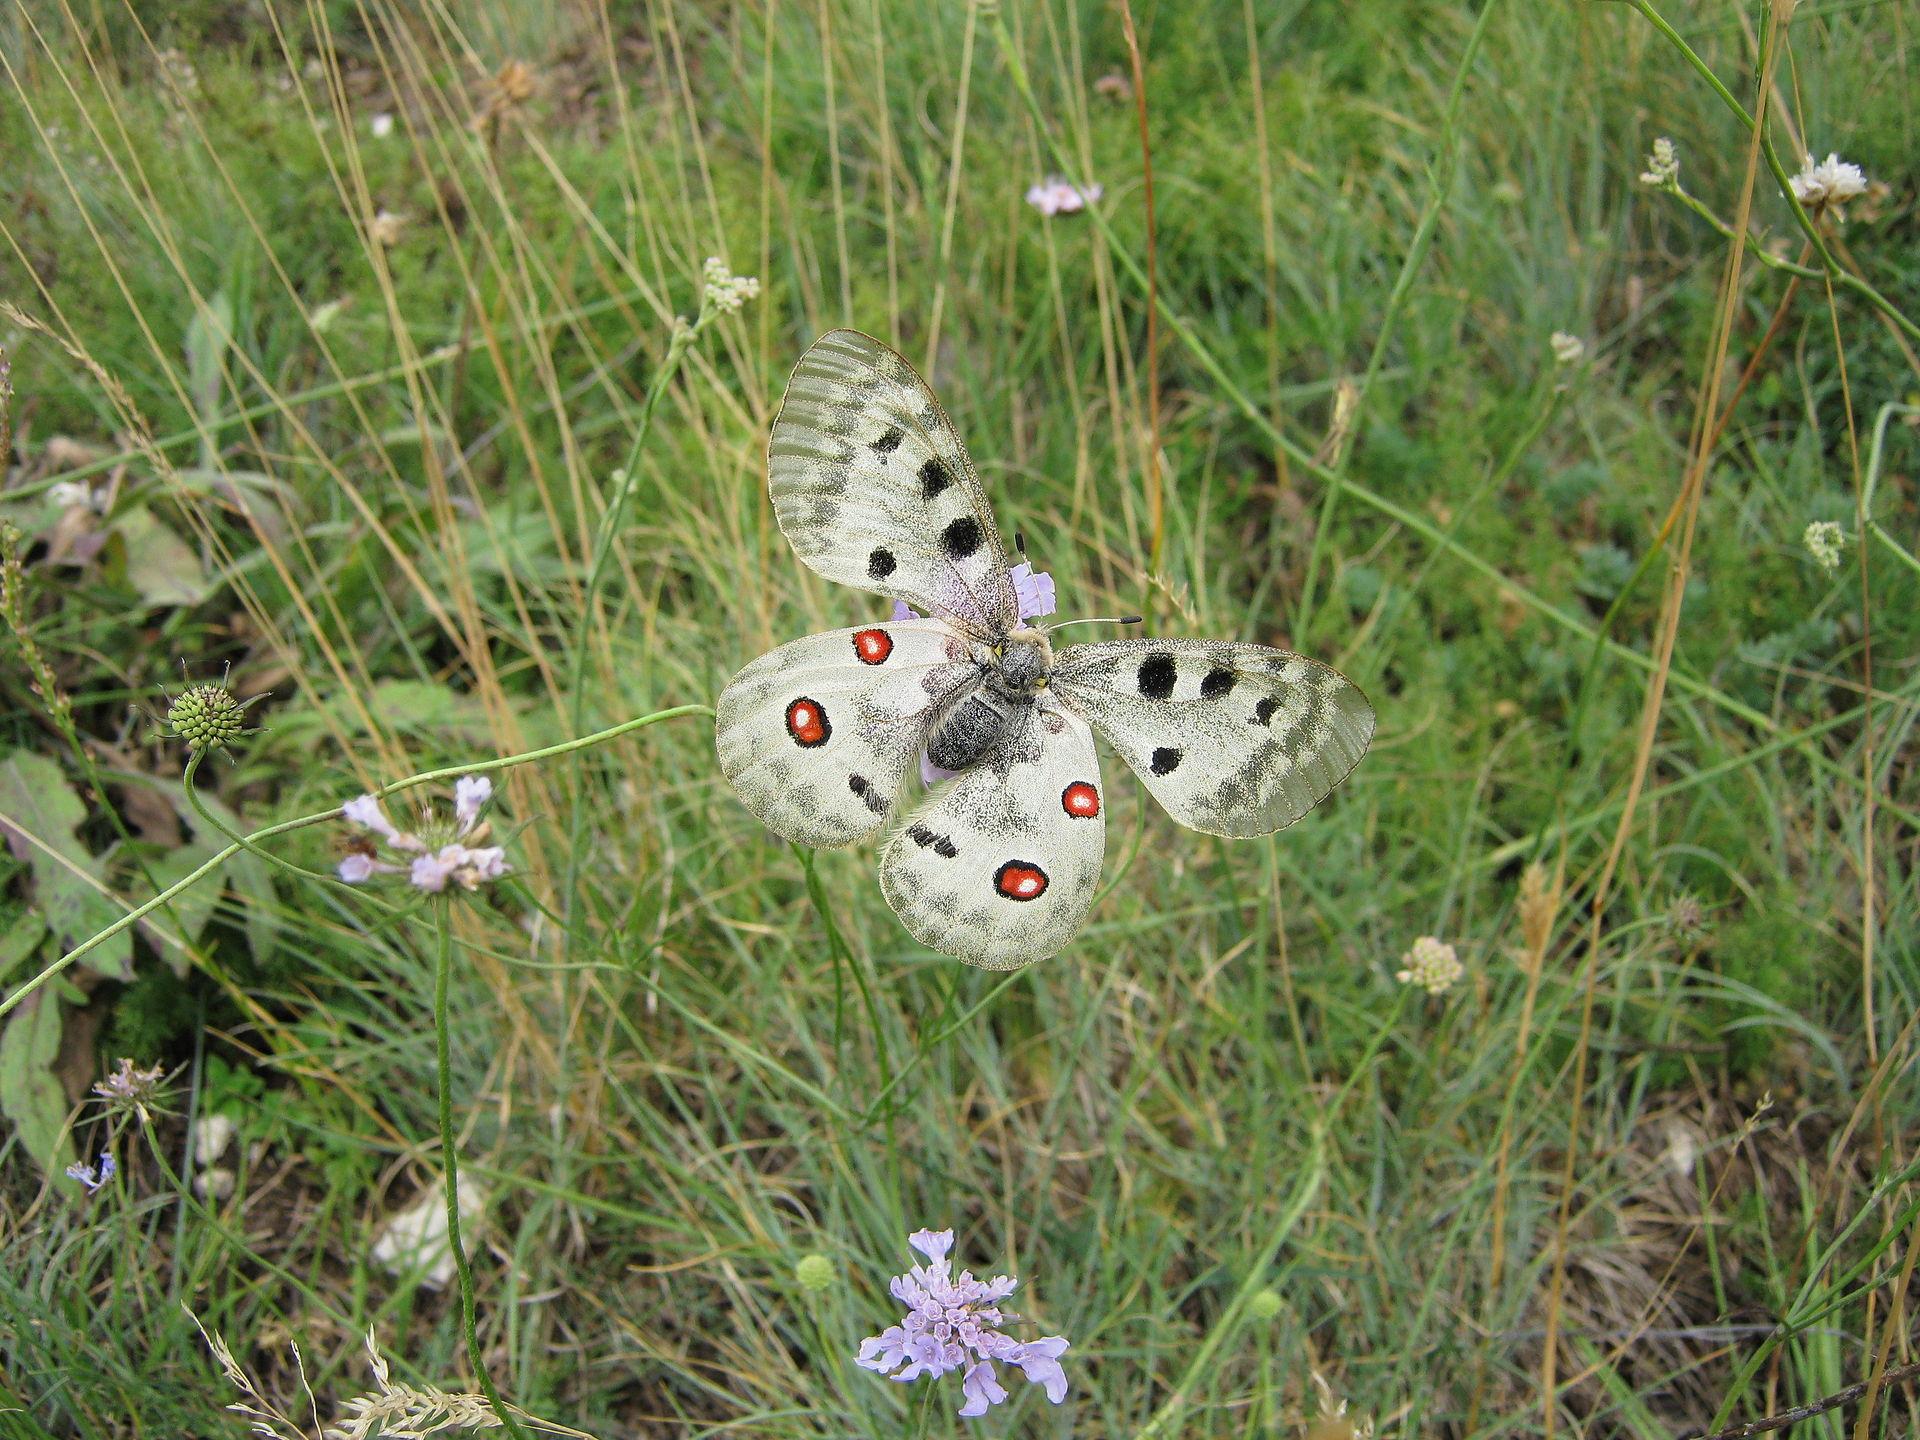 Apollo_Butterfly_of_Gran_Sasso.jpg